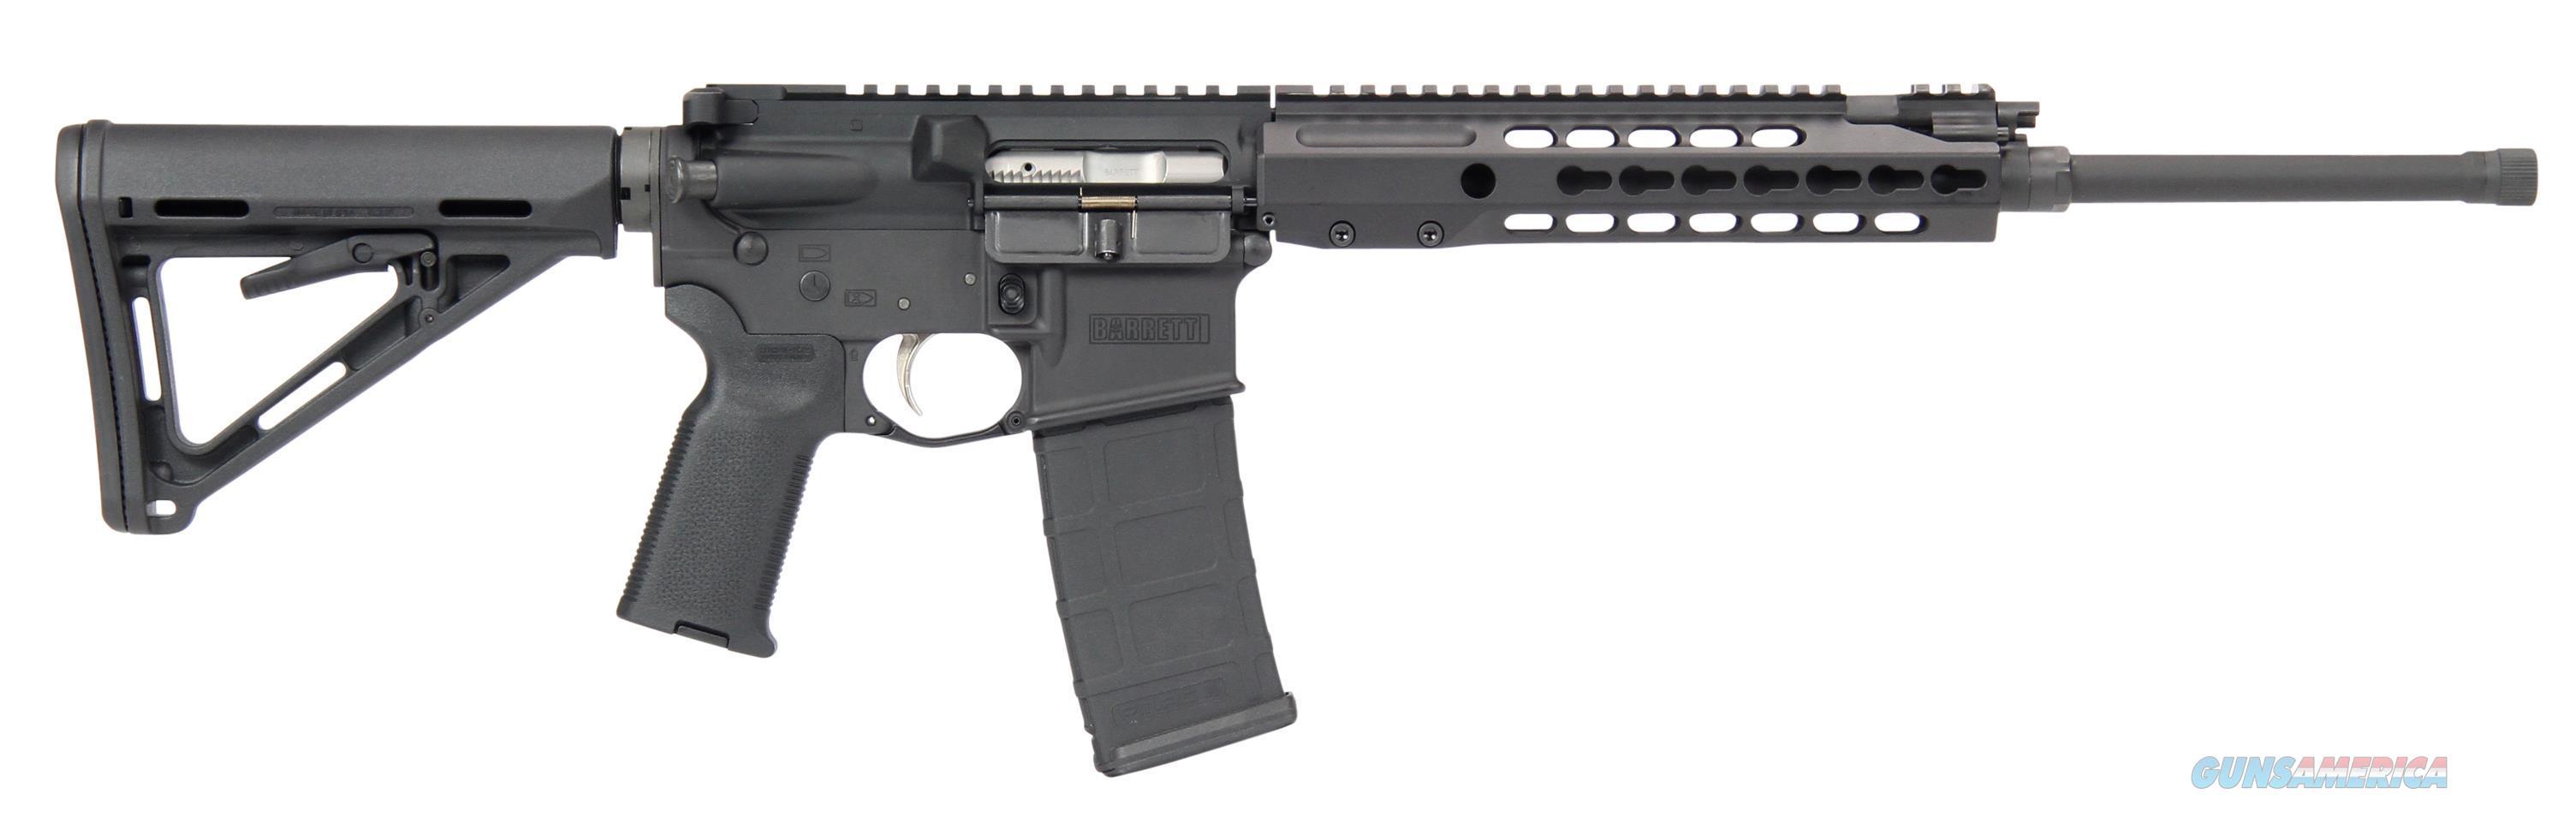 Barrett Rec7 Gen 2 6.8Mm 16 Flyweight Barrel Blk Rc 13958  Guns > Rifles > Barrett Rifles